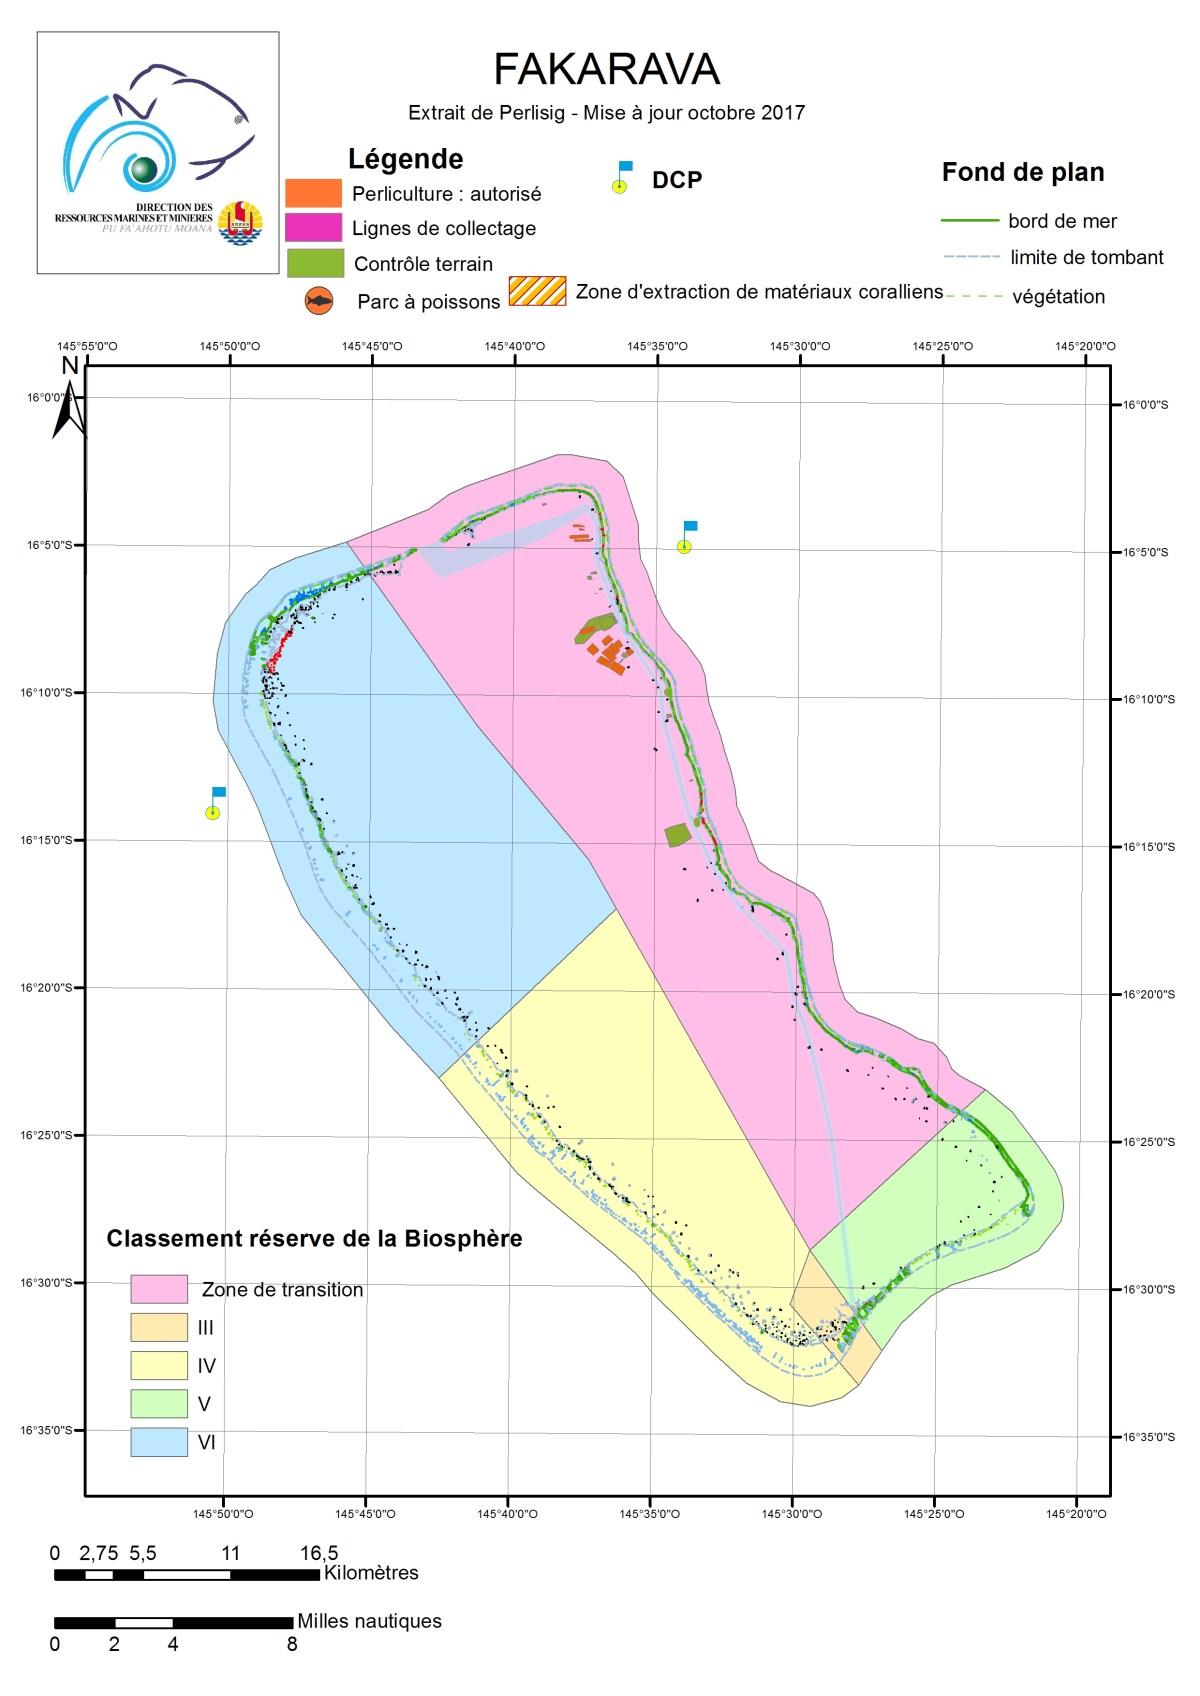 Atlas de Polynésie : Fakarava au 06/10/2017